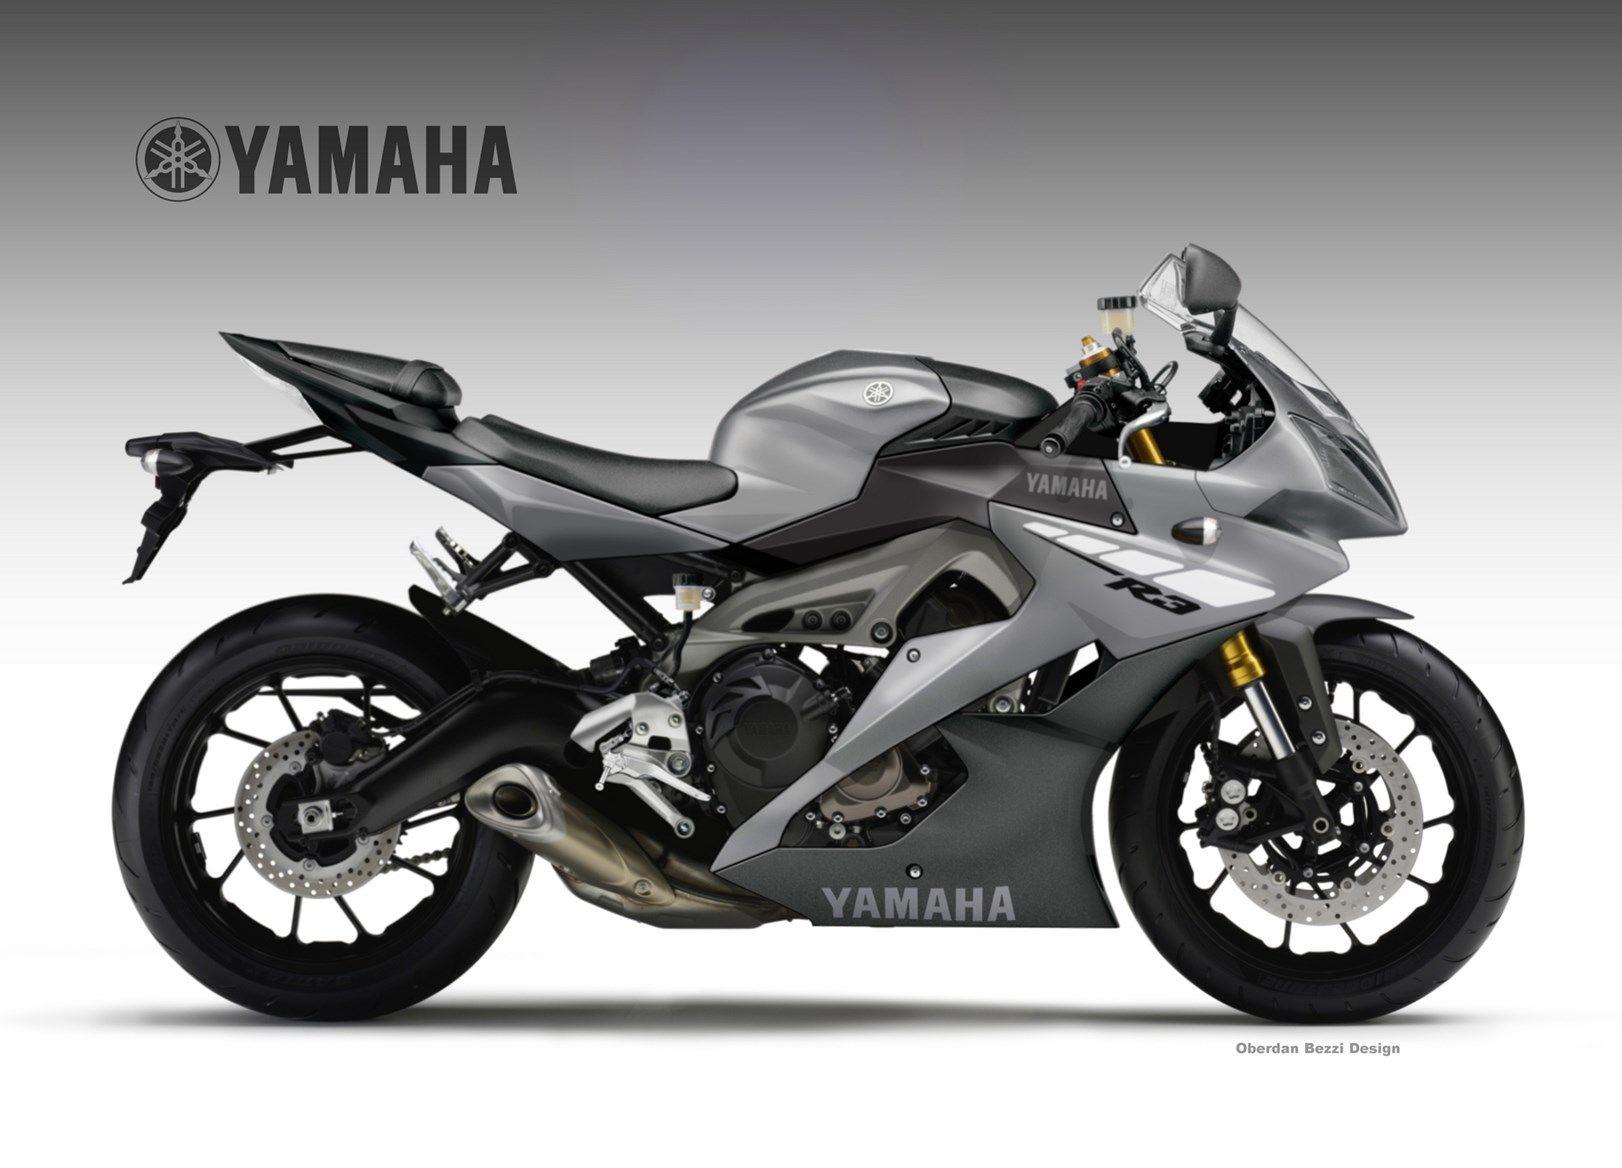 yamaha r3 - google search | yamaha | pinterest | motorbikes